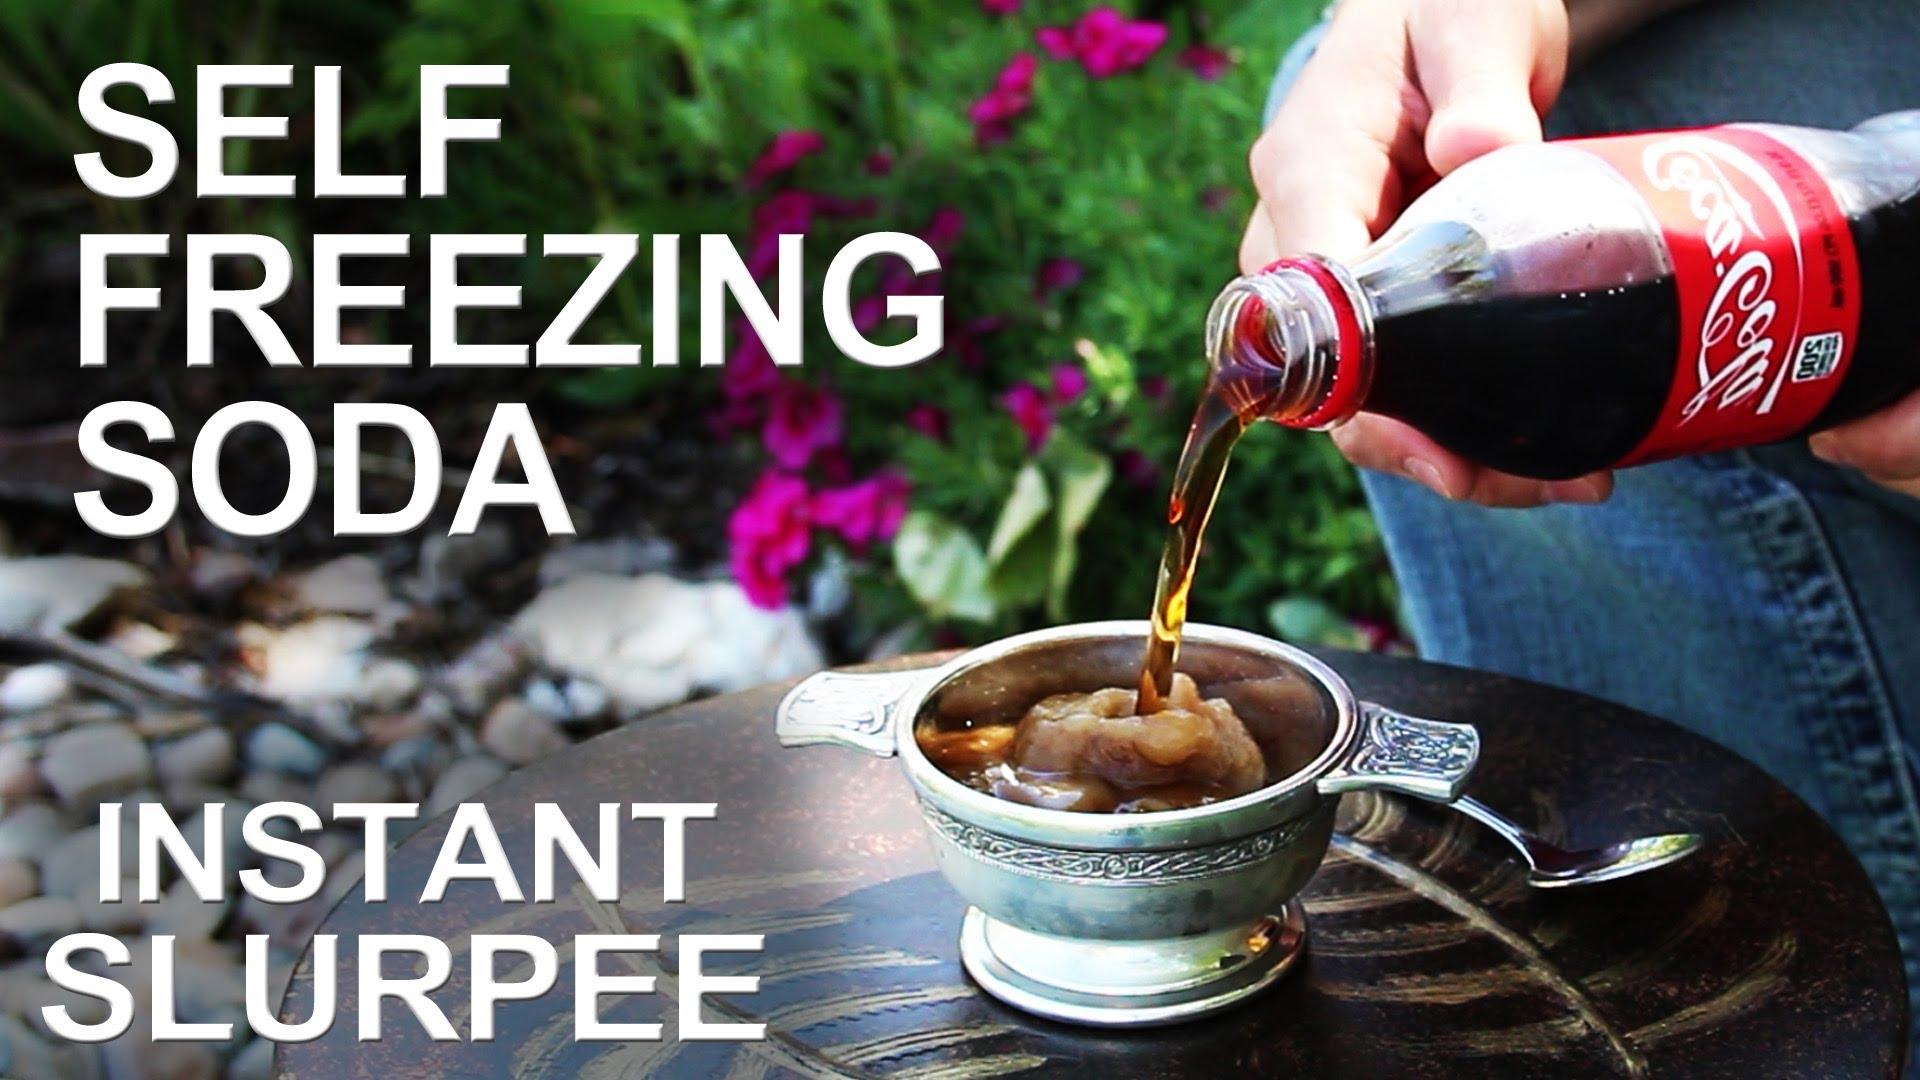 The Self-Freezing Soda Pop Trick